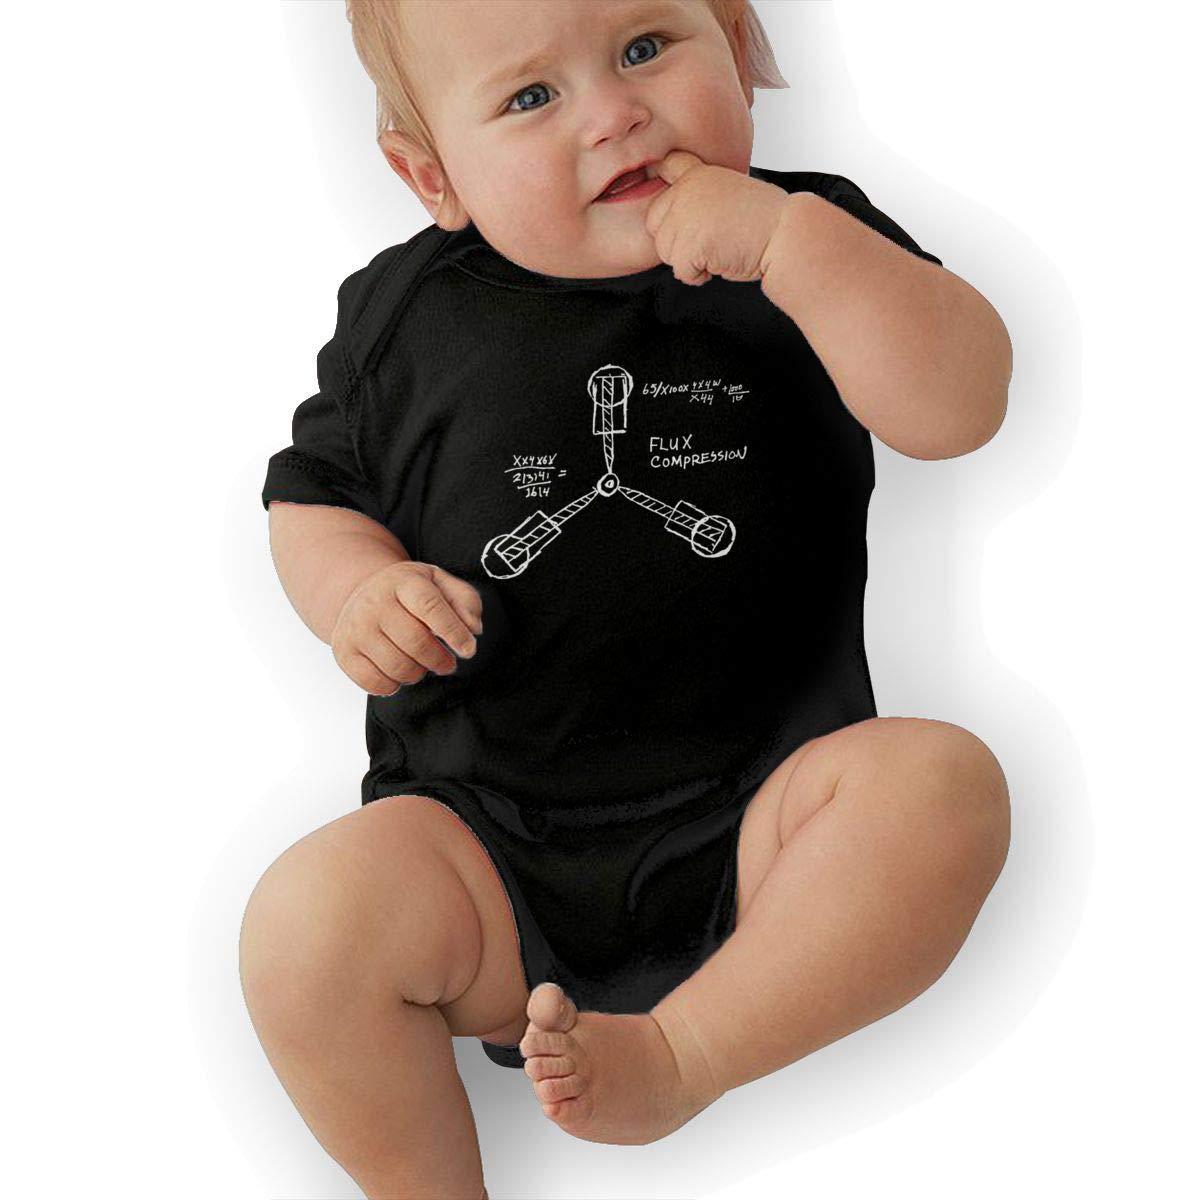 Xuforget Back to The Future Babys Boys /& Girls Short Sleeve Bodysuit Babys